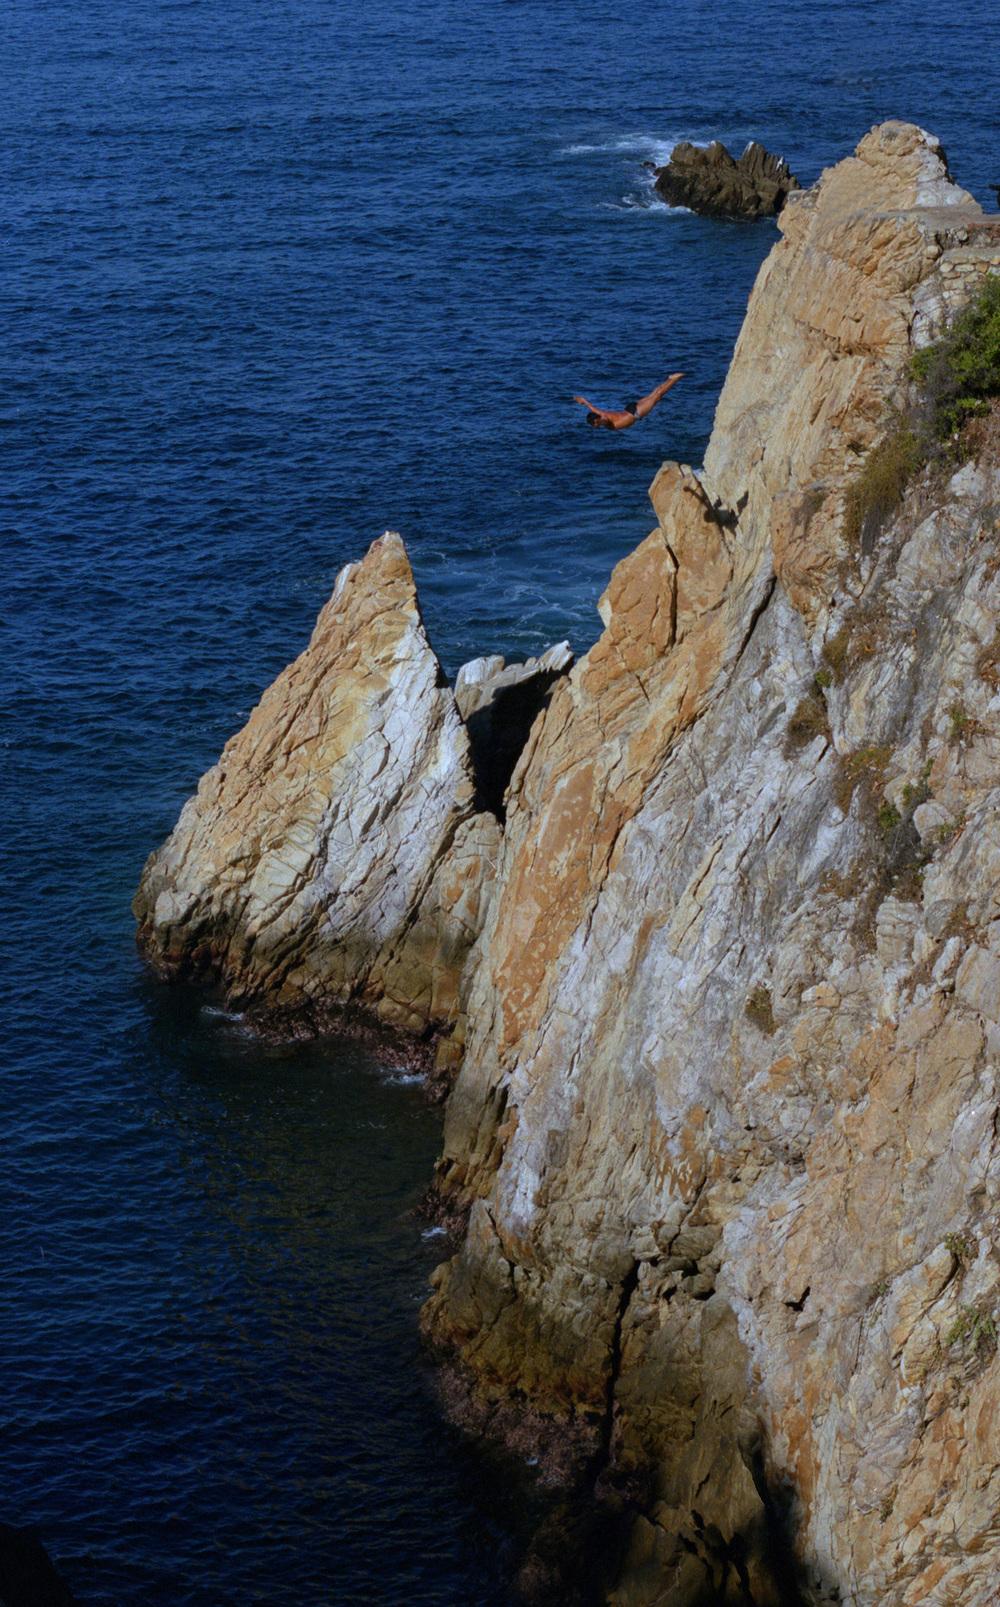 Acapulco Diver